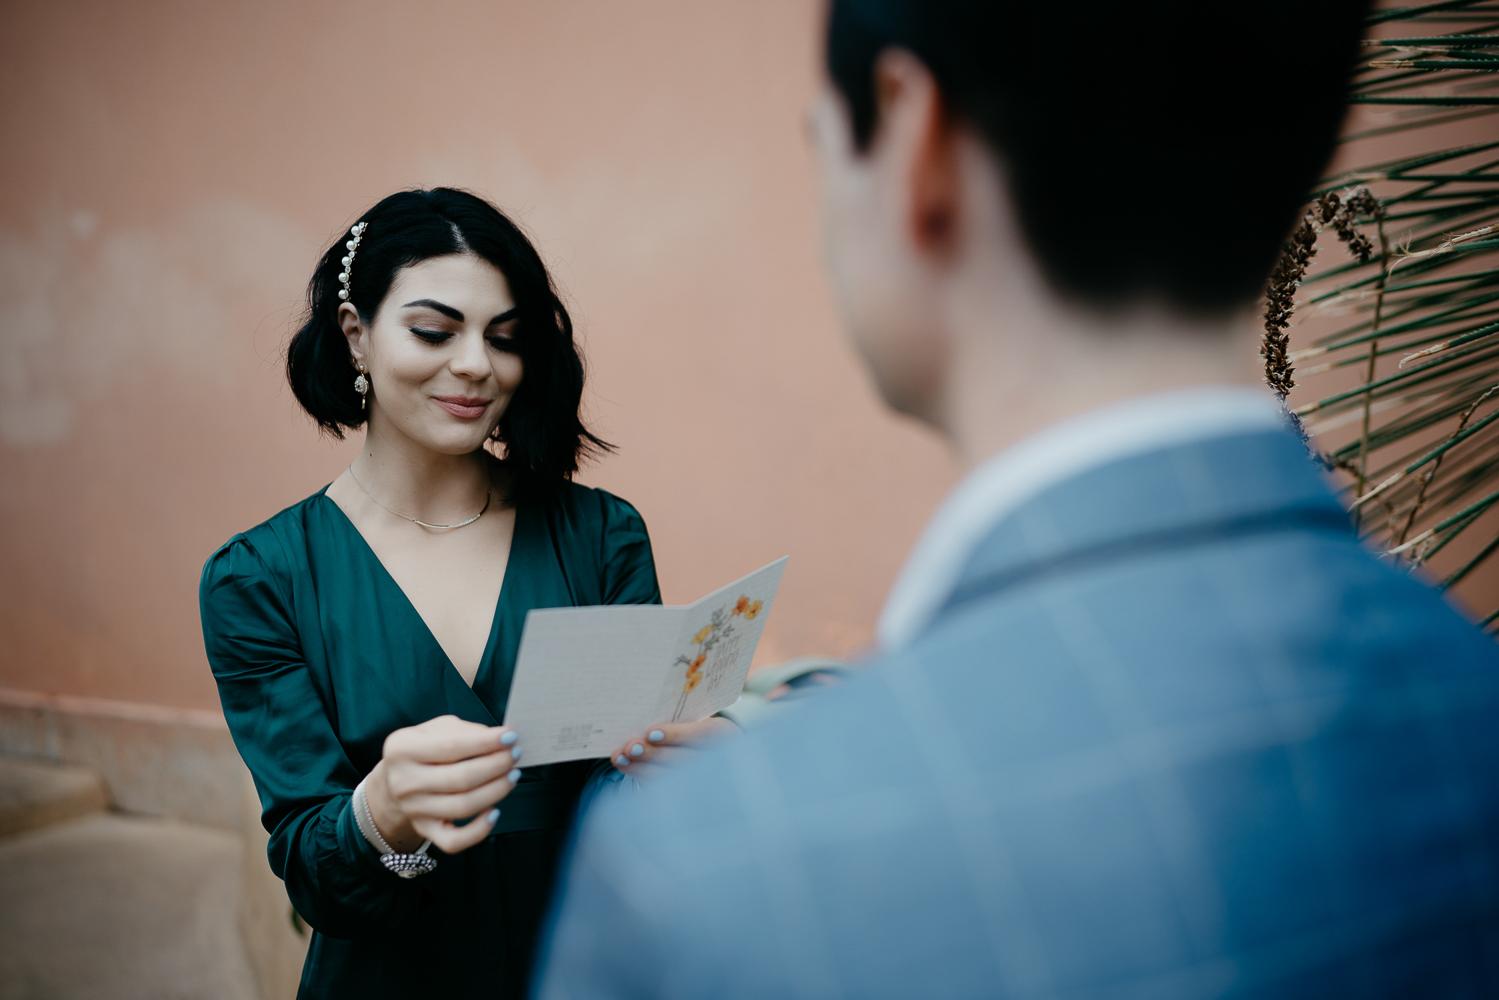 bruidspaar verloving fotoshoot amsterdam fotograaf mark hadden